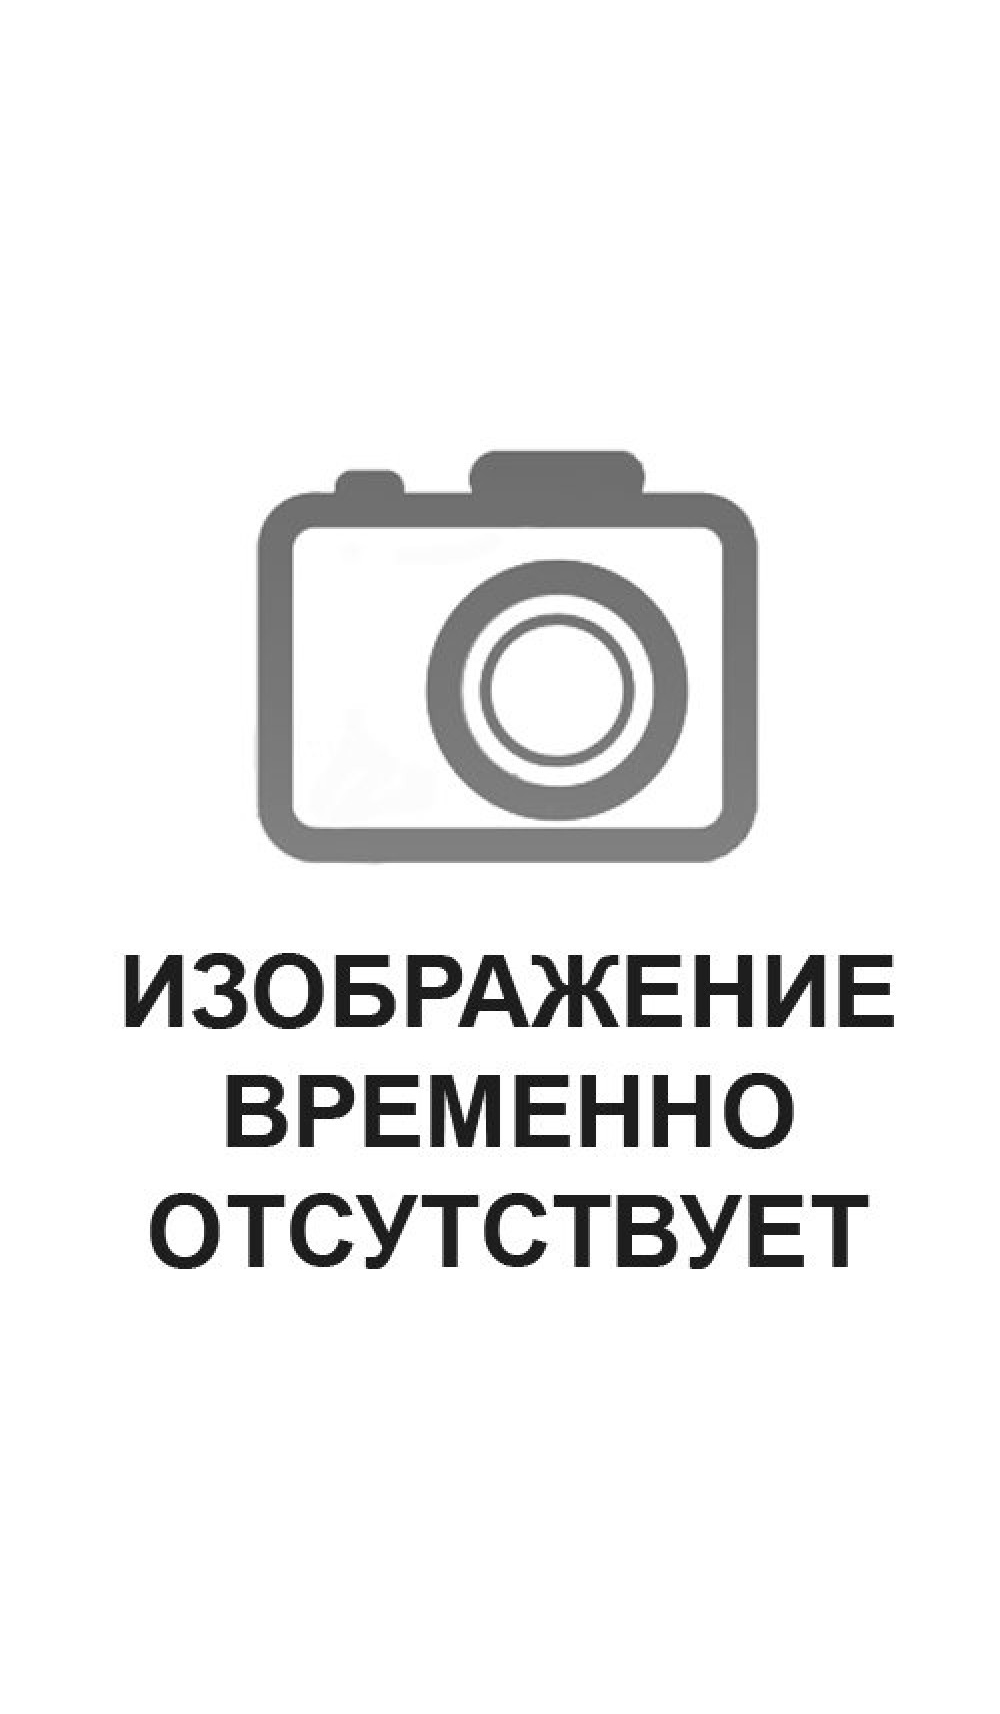 Варежки Remu 6070-750 Travalle — фото 1